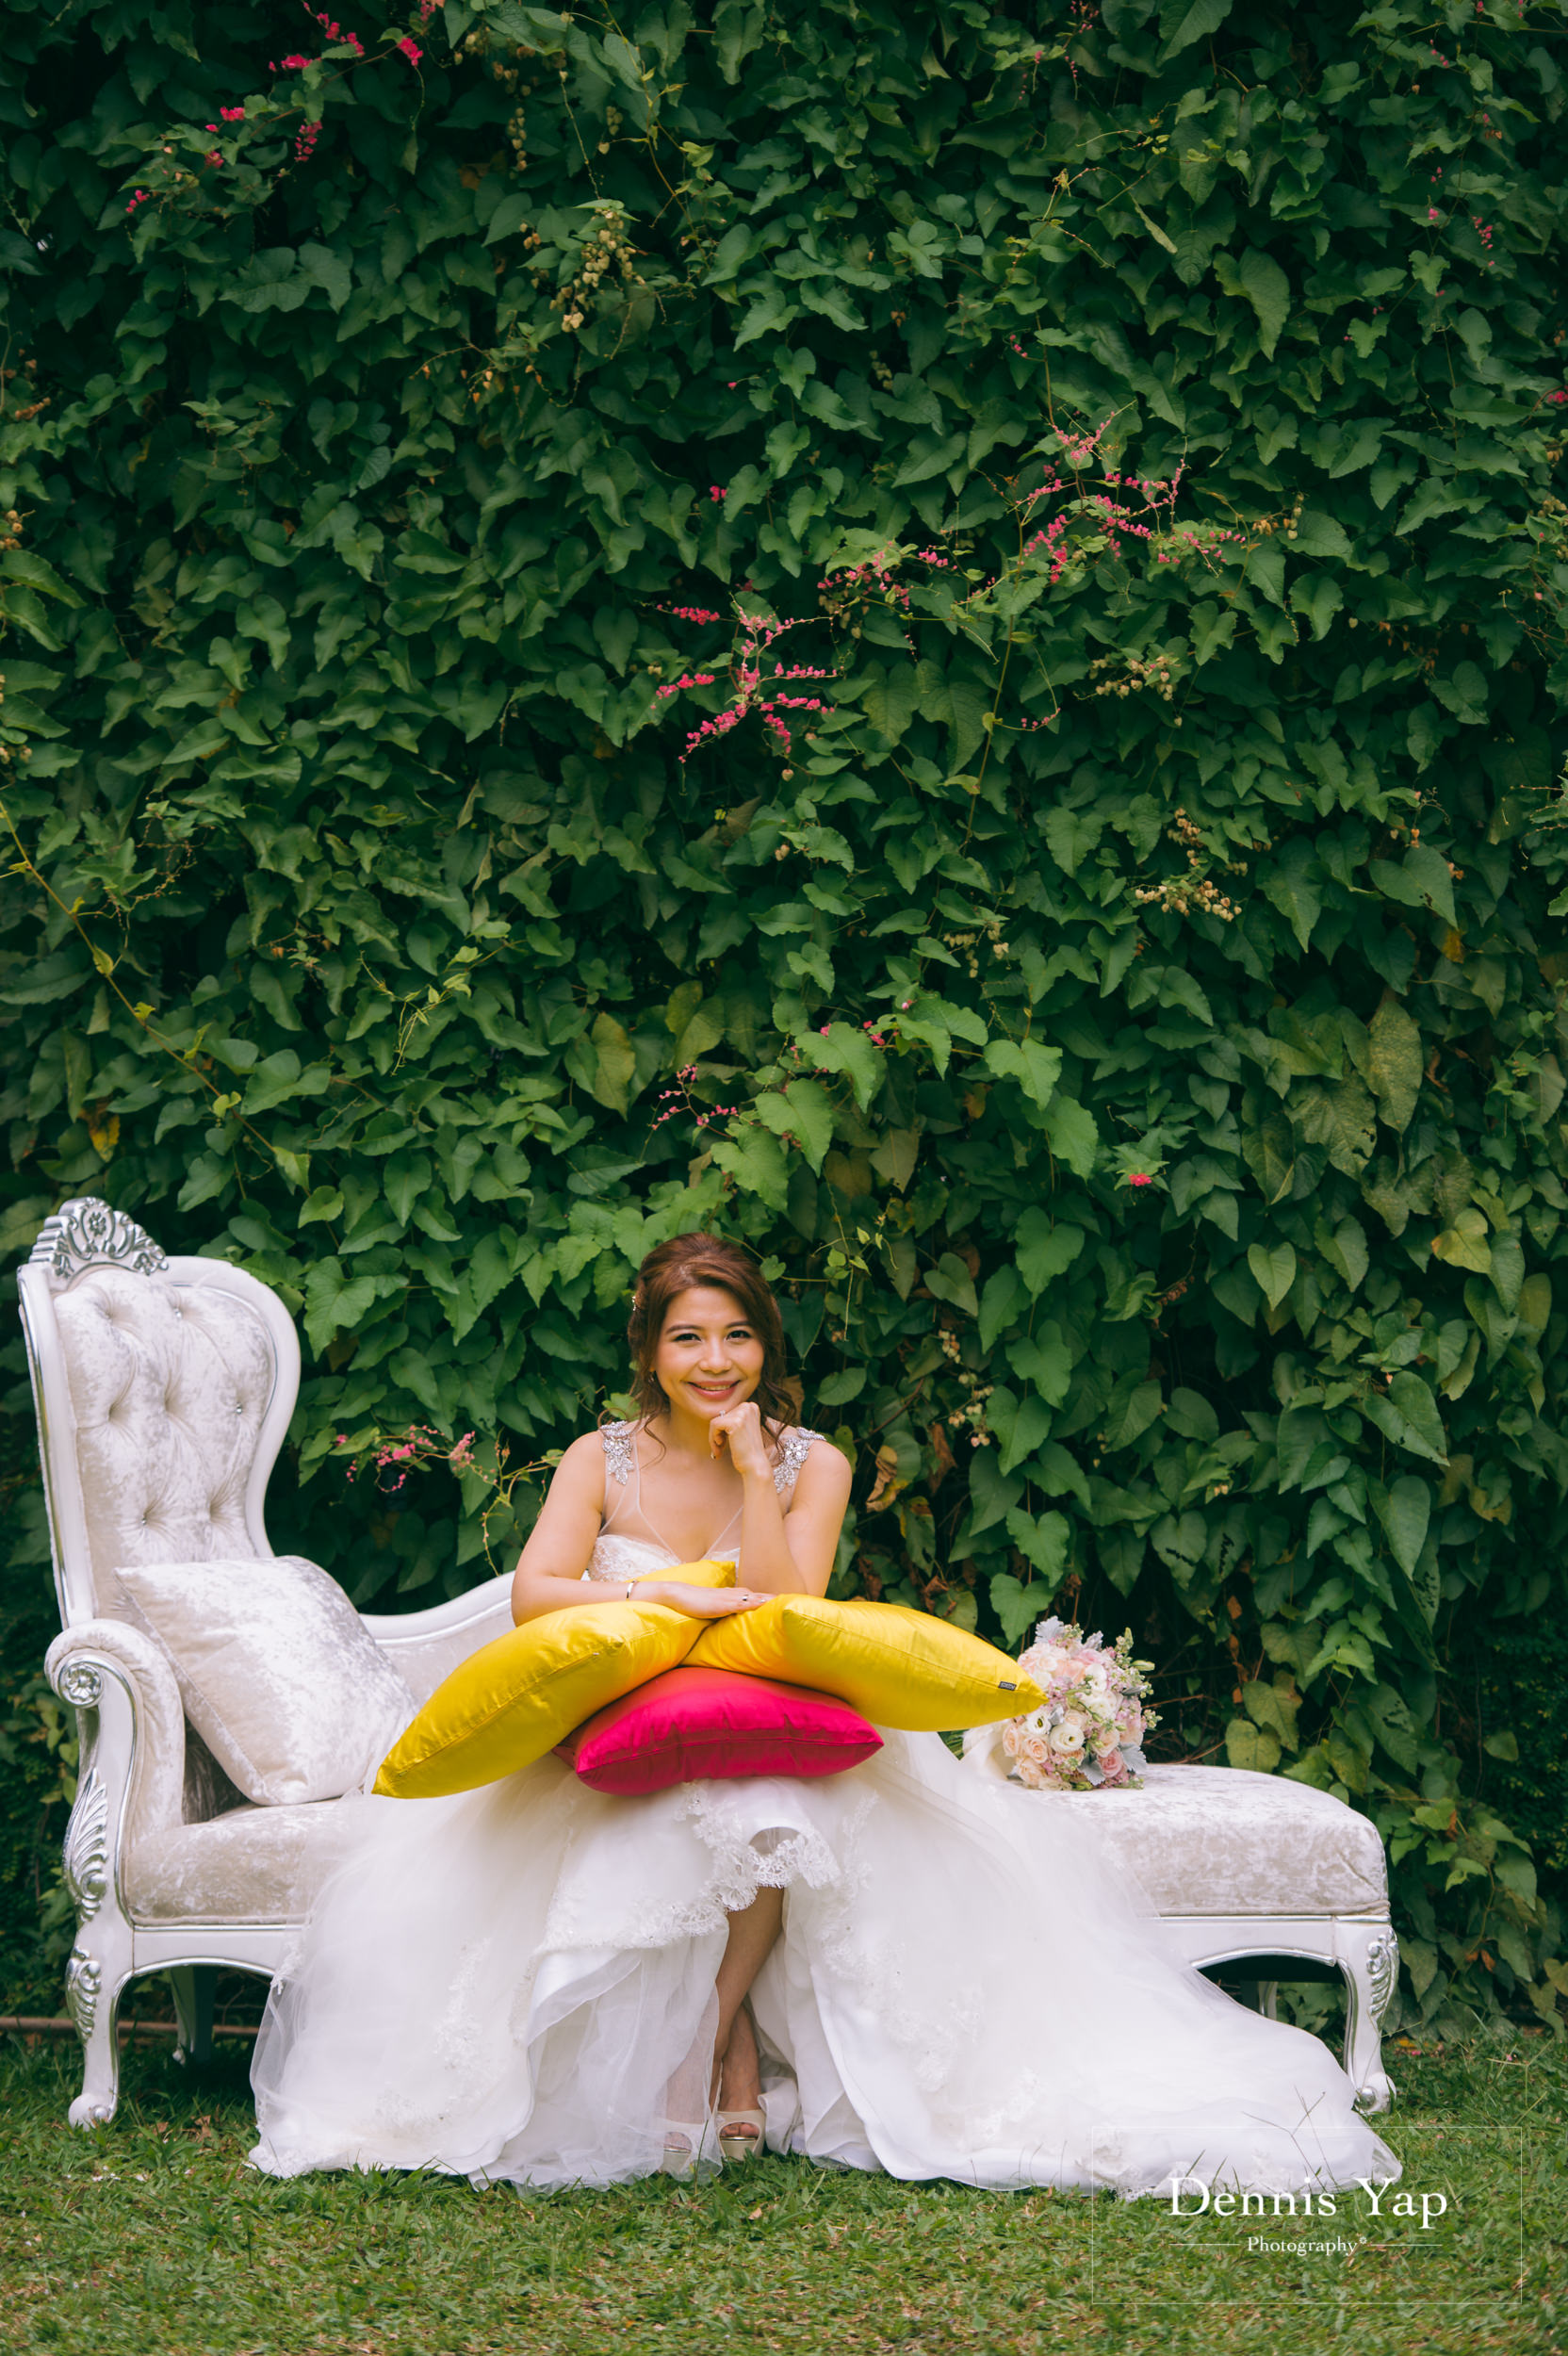 pung doris pre wedding desa park dennis yap photography-25.jpg